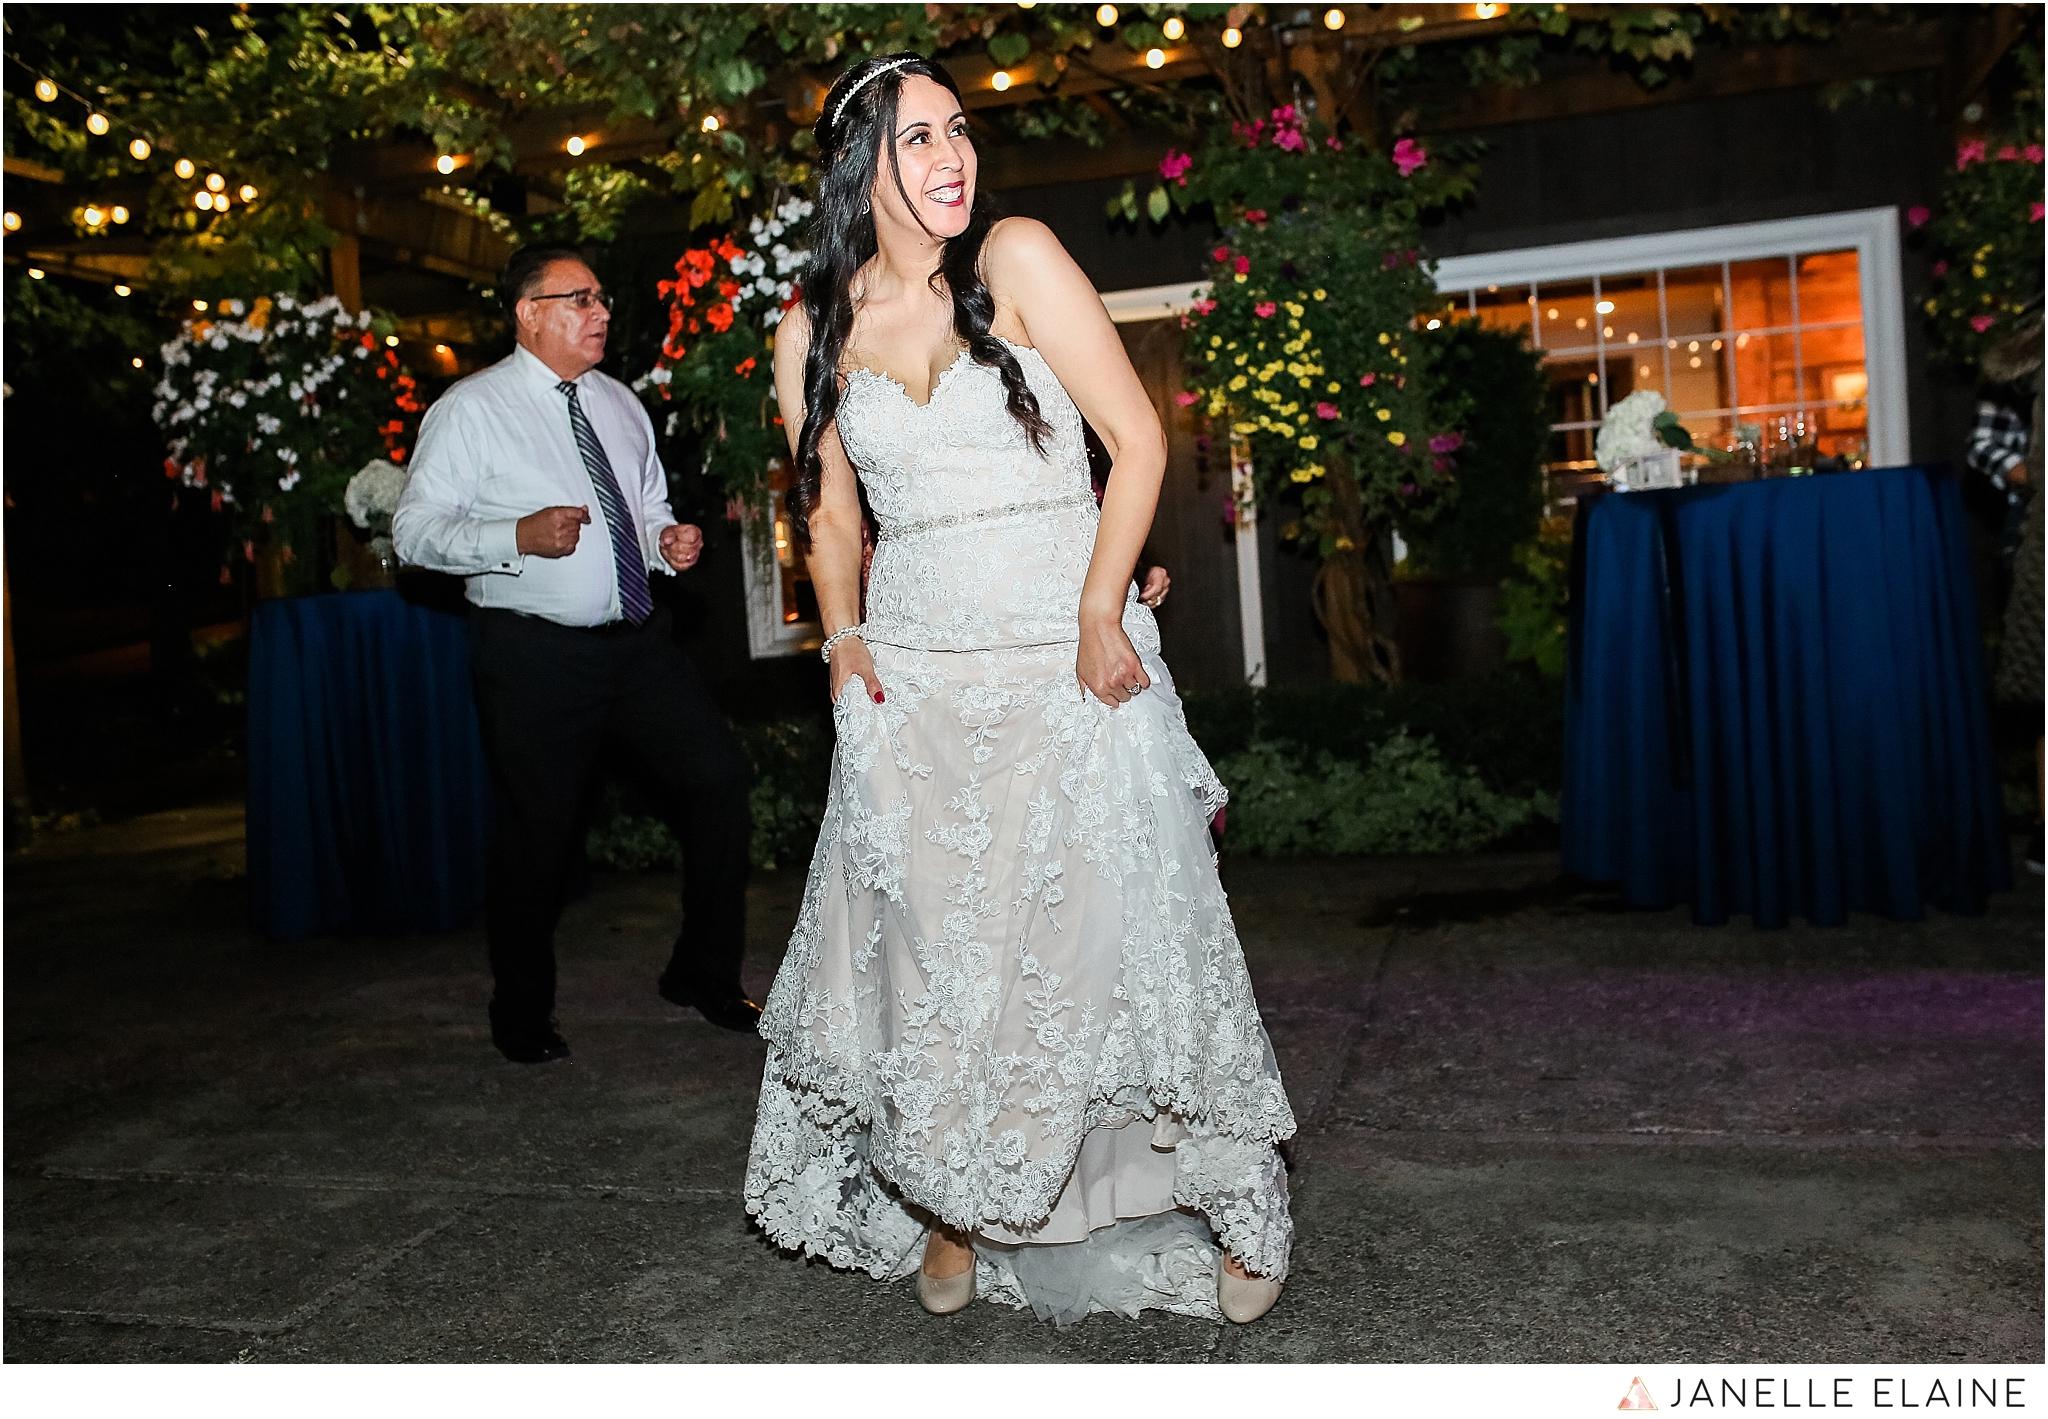 janelle elaine photography-professional wedding photographer-seattle-bellevue-robinswood house-304.jpg